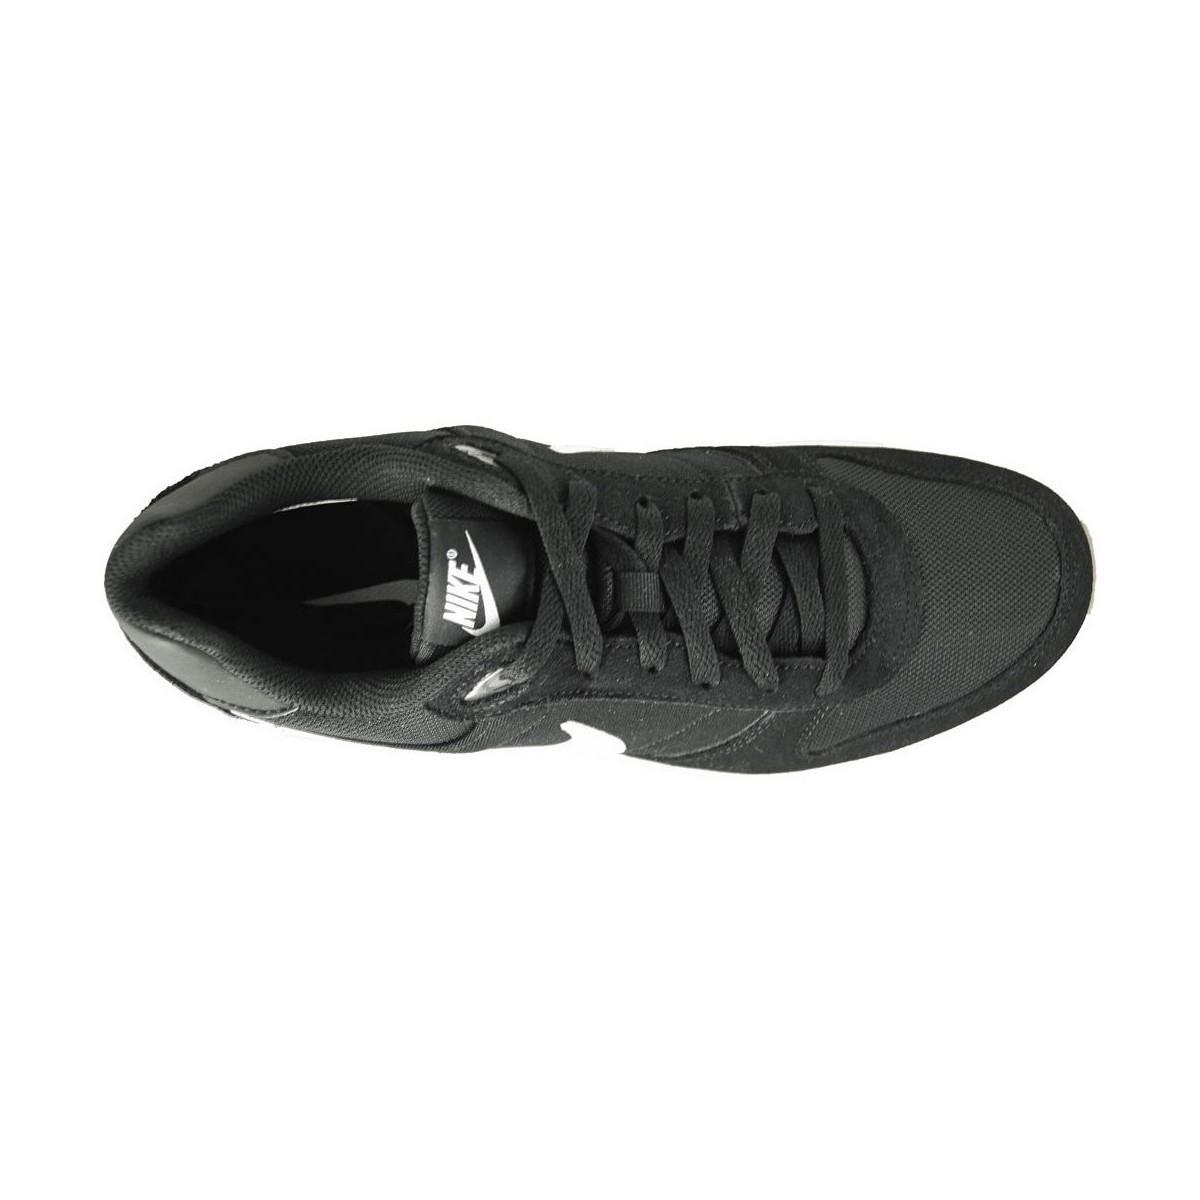 Nike Nightgazer Men's Shoes (trainers) In Multicolour in Black for Men